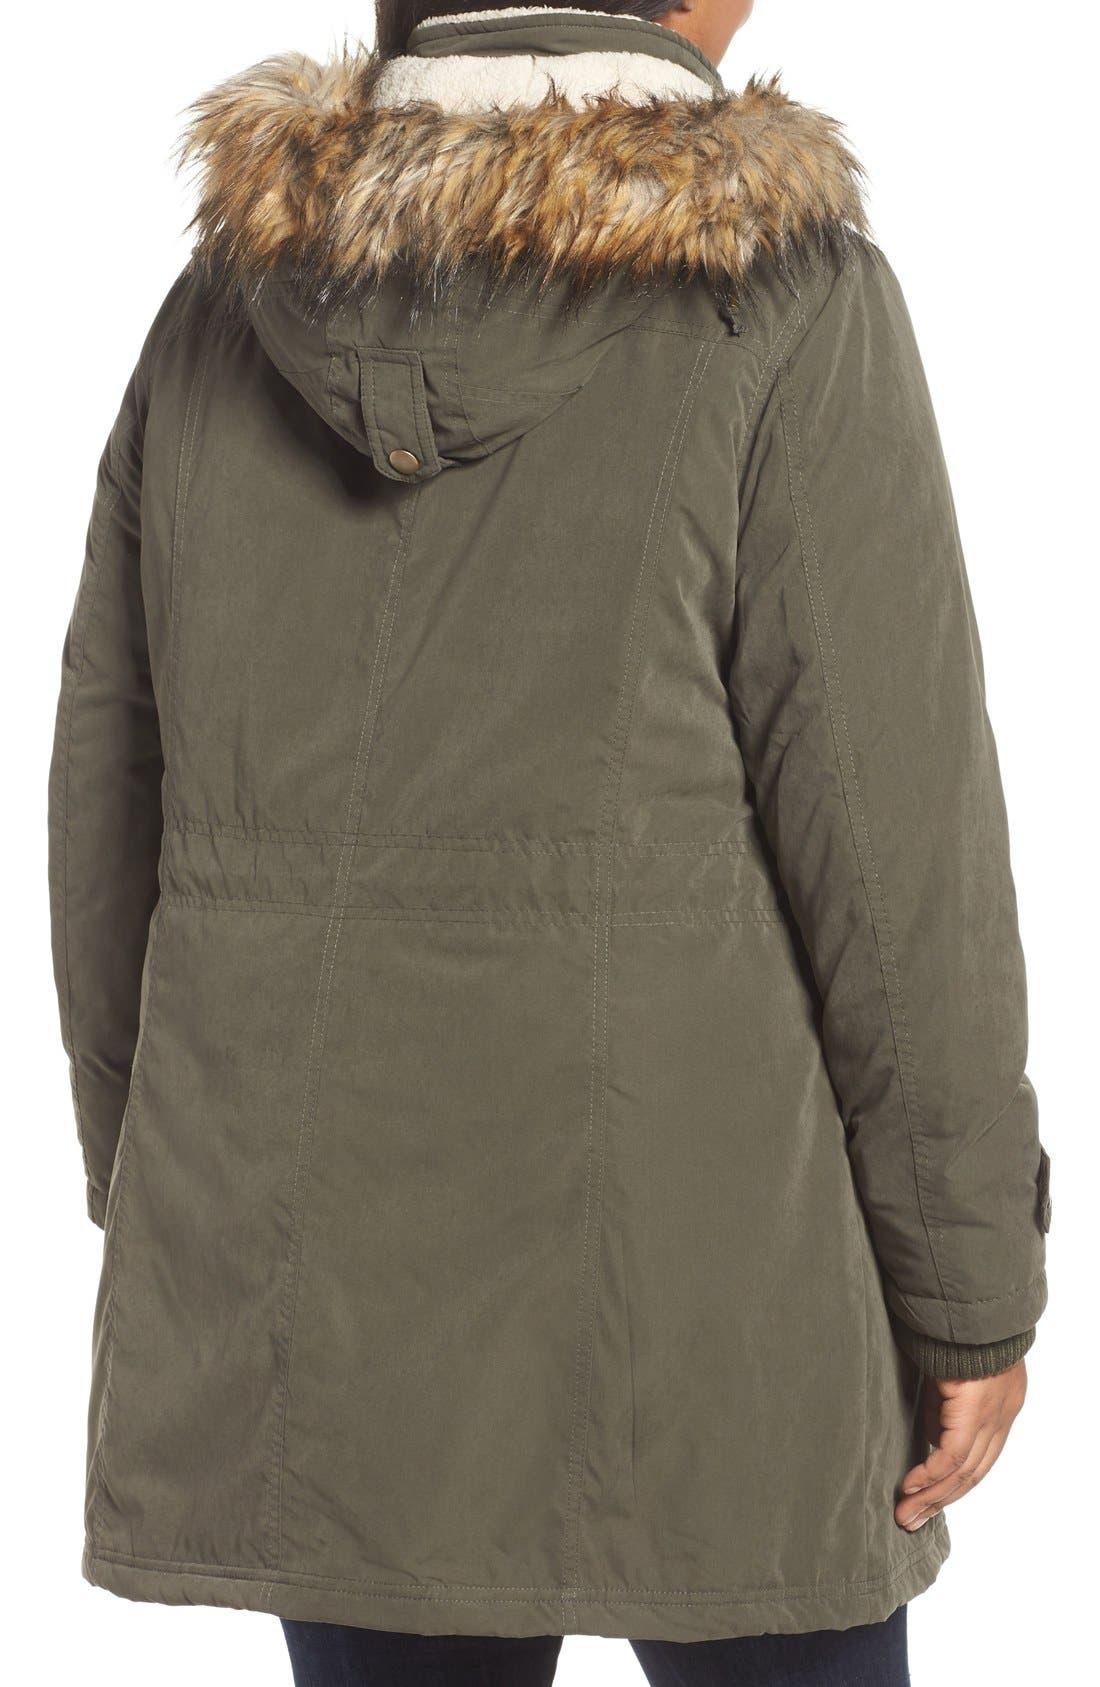 Alternate Image 2  - Halogen® Hooded Parka with Faux Fur Trim (Plus Size)